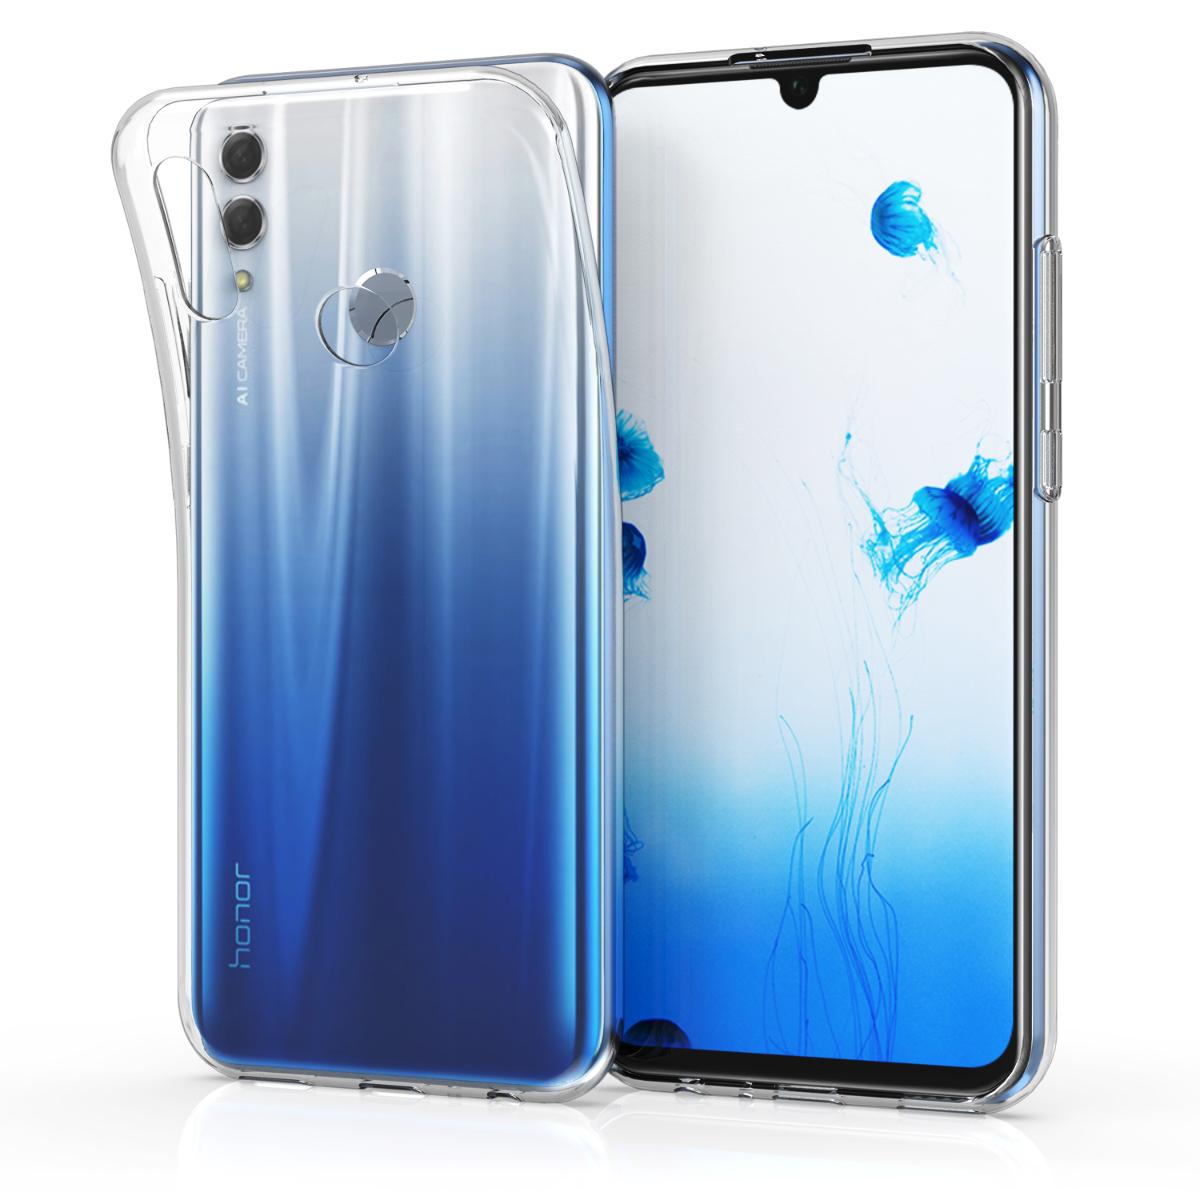 KW Διάφανη Θήκη Σιλικόνης Huawei P Smart 2019 - Transparent (47002.03)